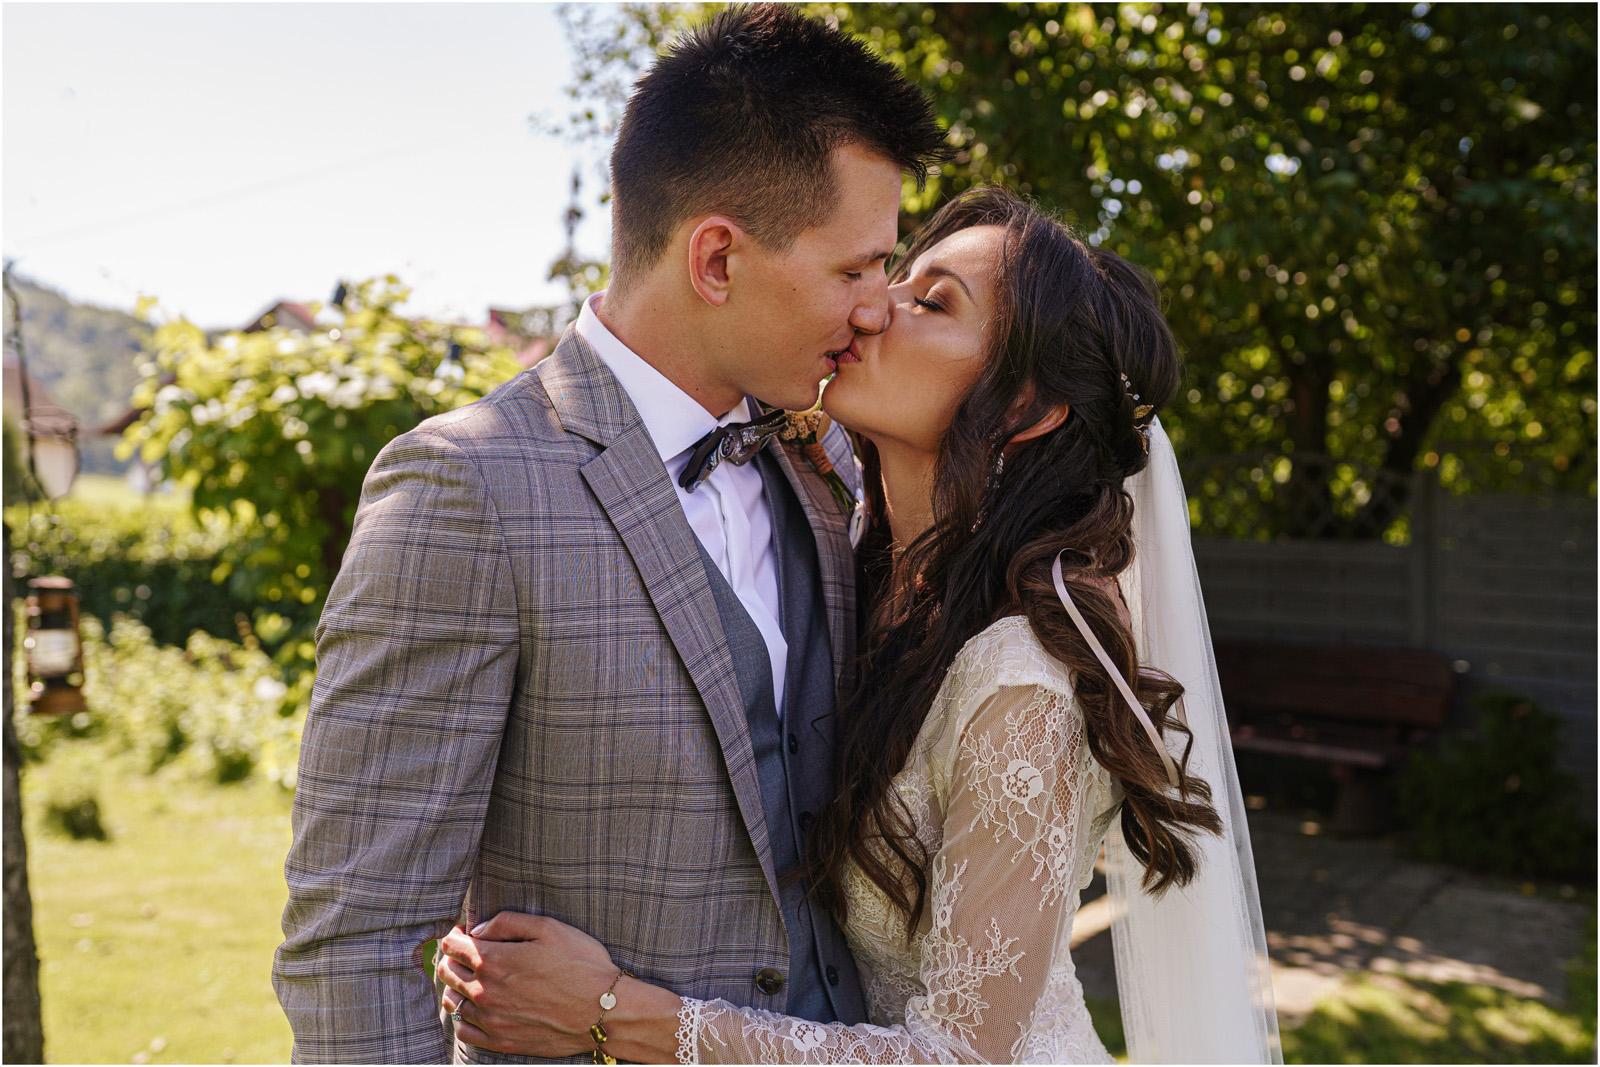 Ania & Mateusz | boho wesele w Stodole pod Kasztanami 24